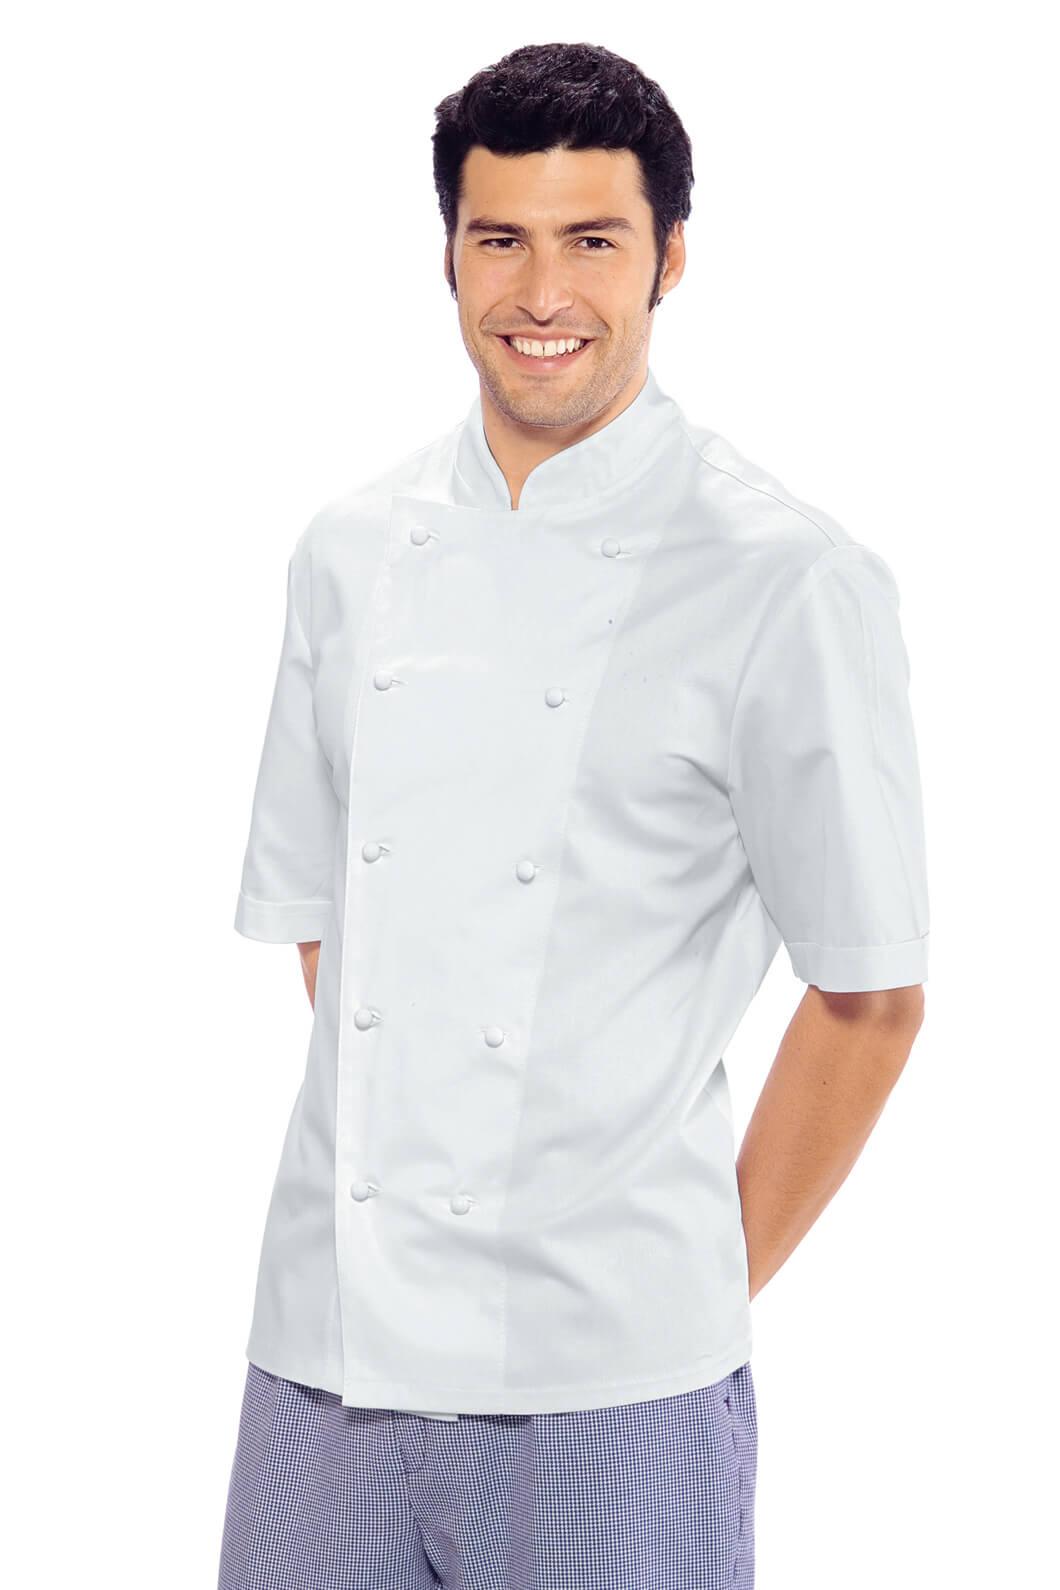 Veste chef cuisinier blanche manches courtes roma for Cuisinier 71